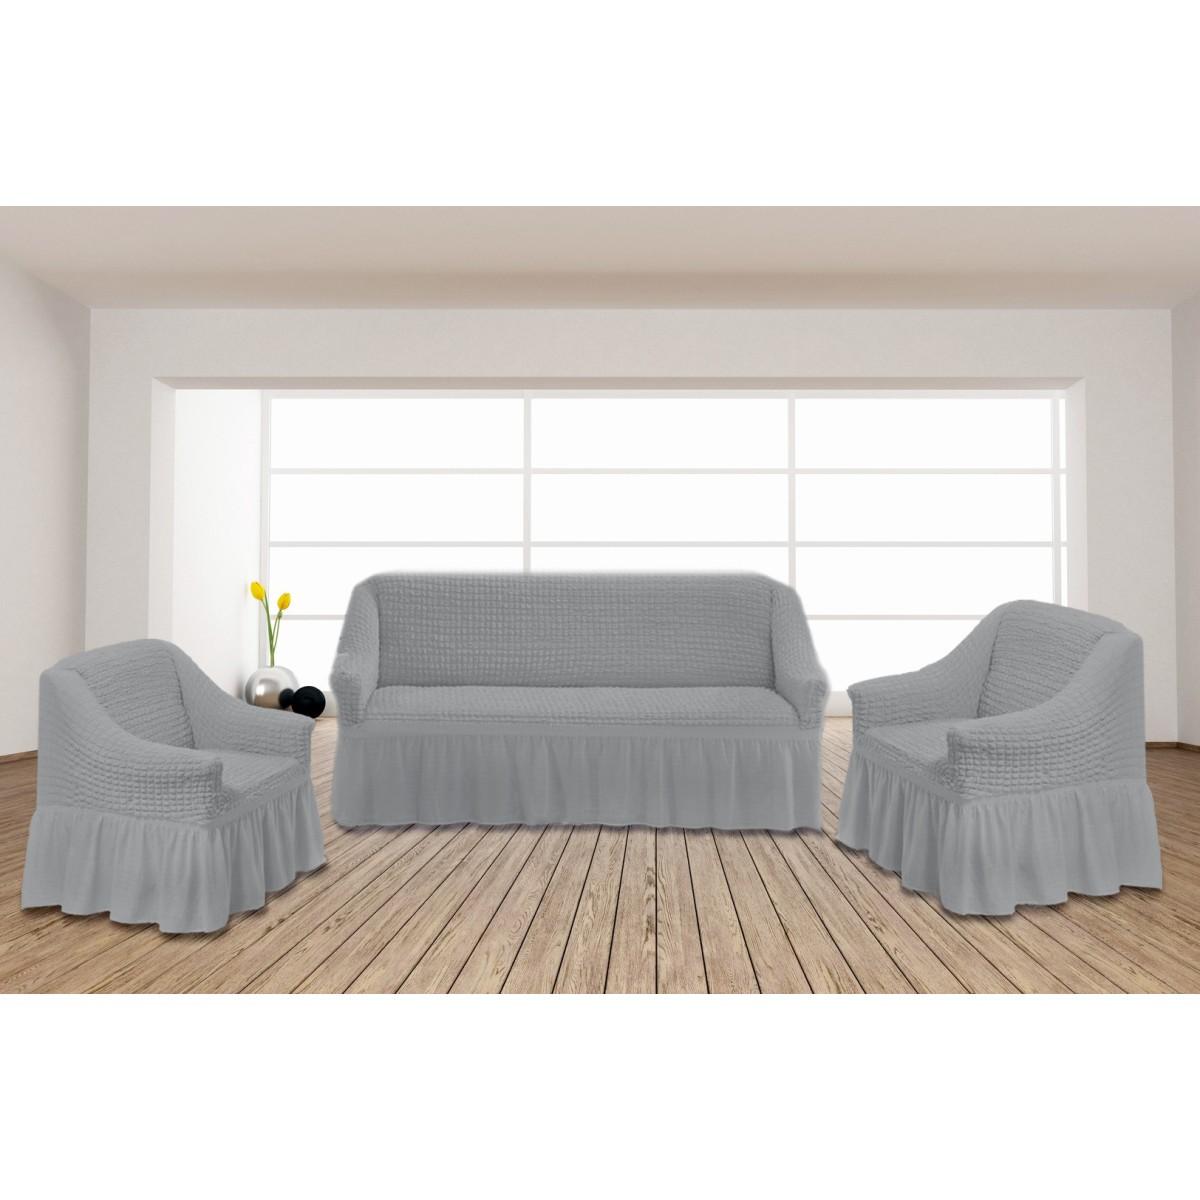 Комплект чехлов для мебели Texrepublic Absolute 8823